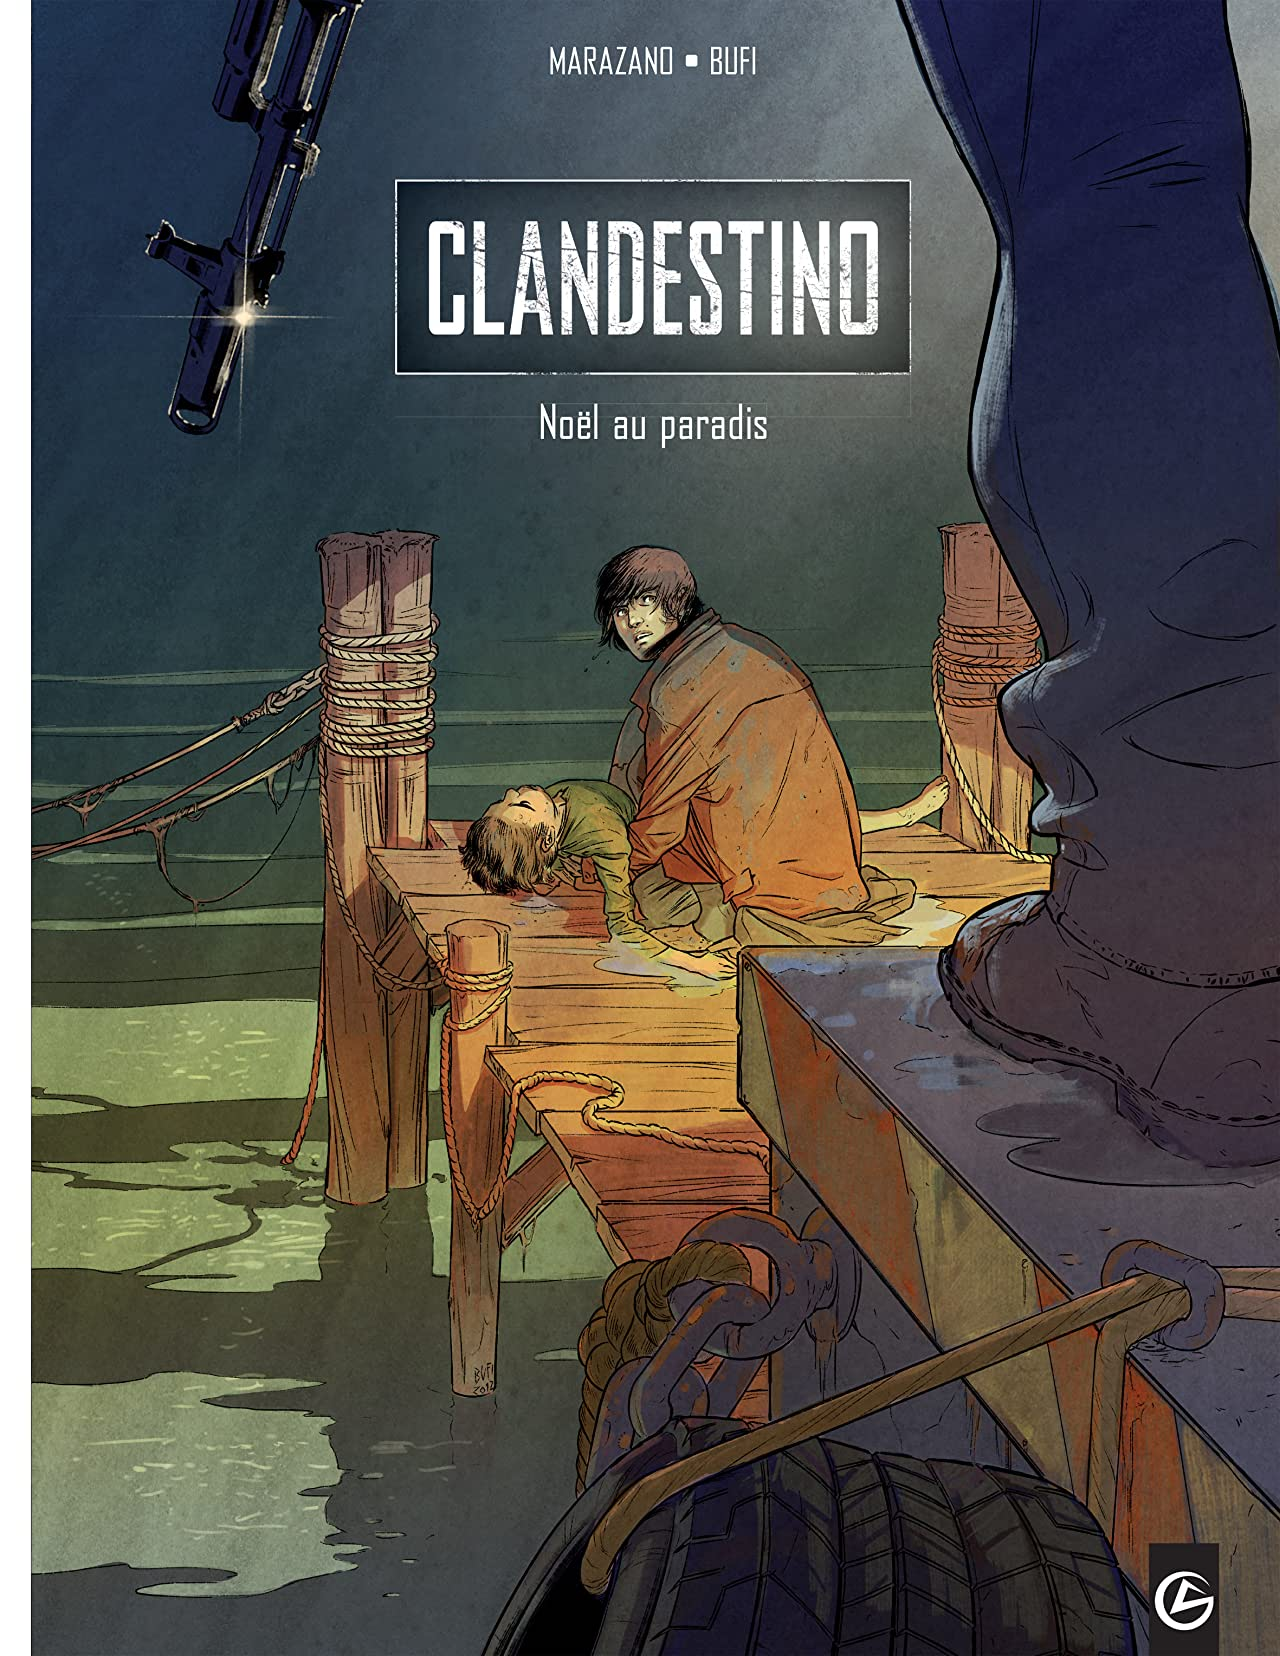 Clandestino Vol. 1: Noël au paradis